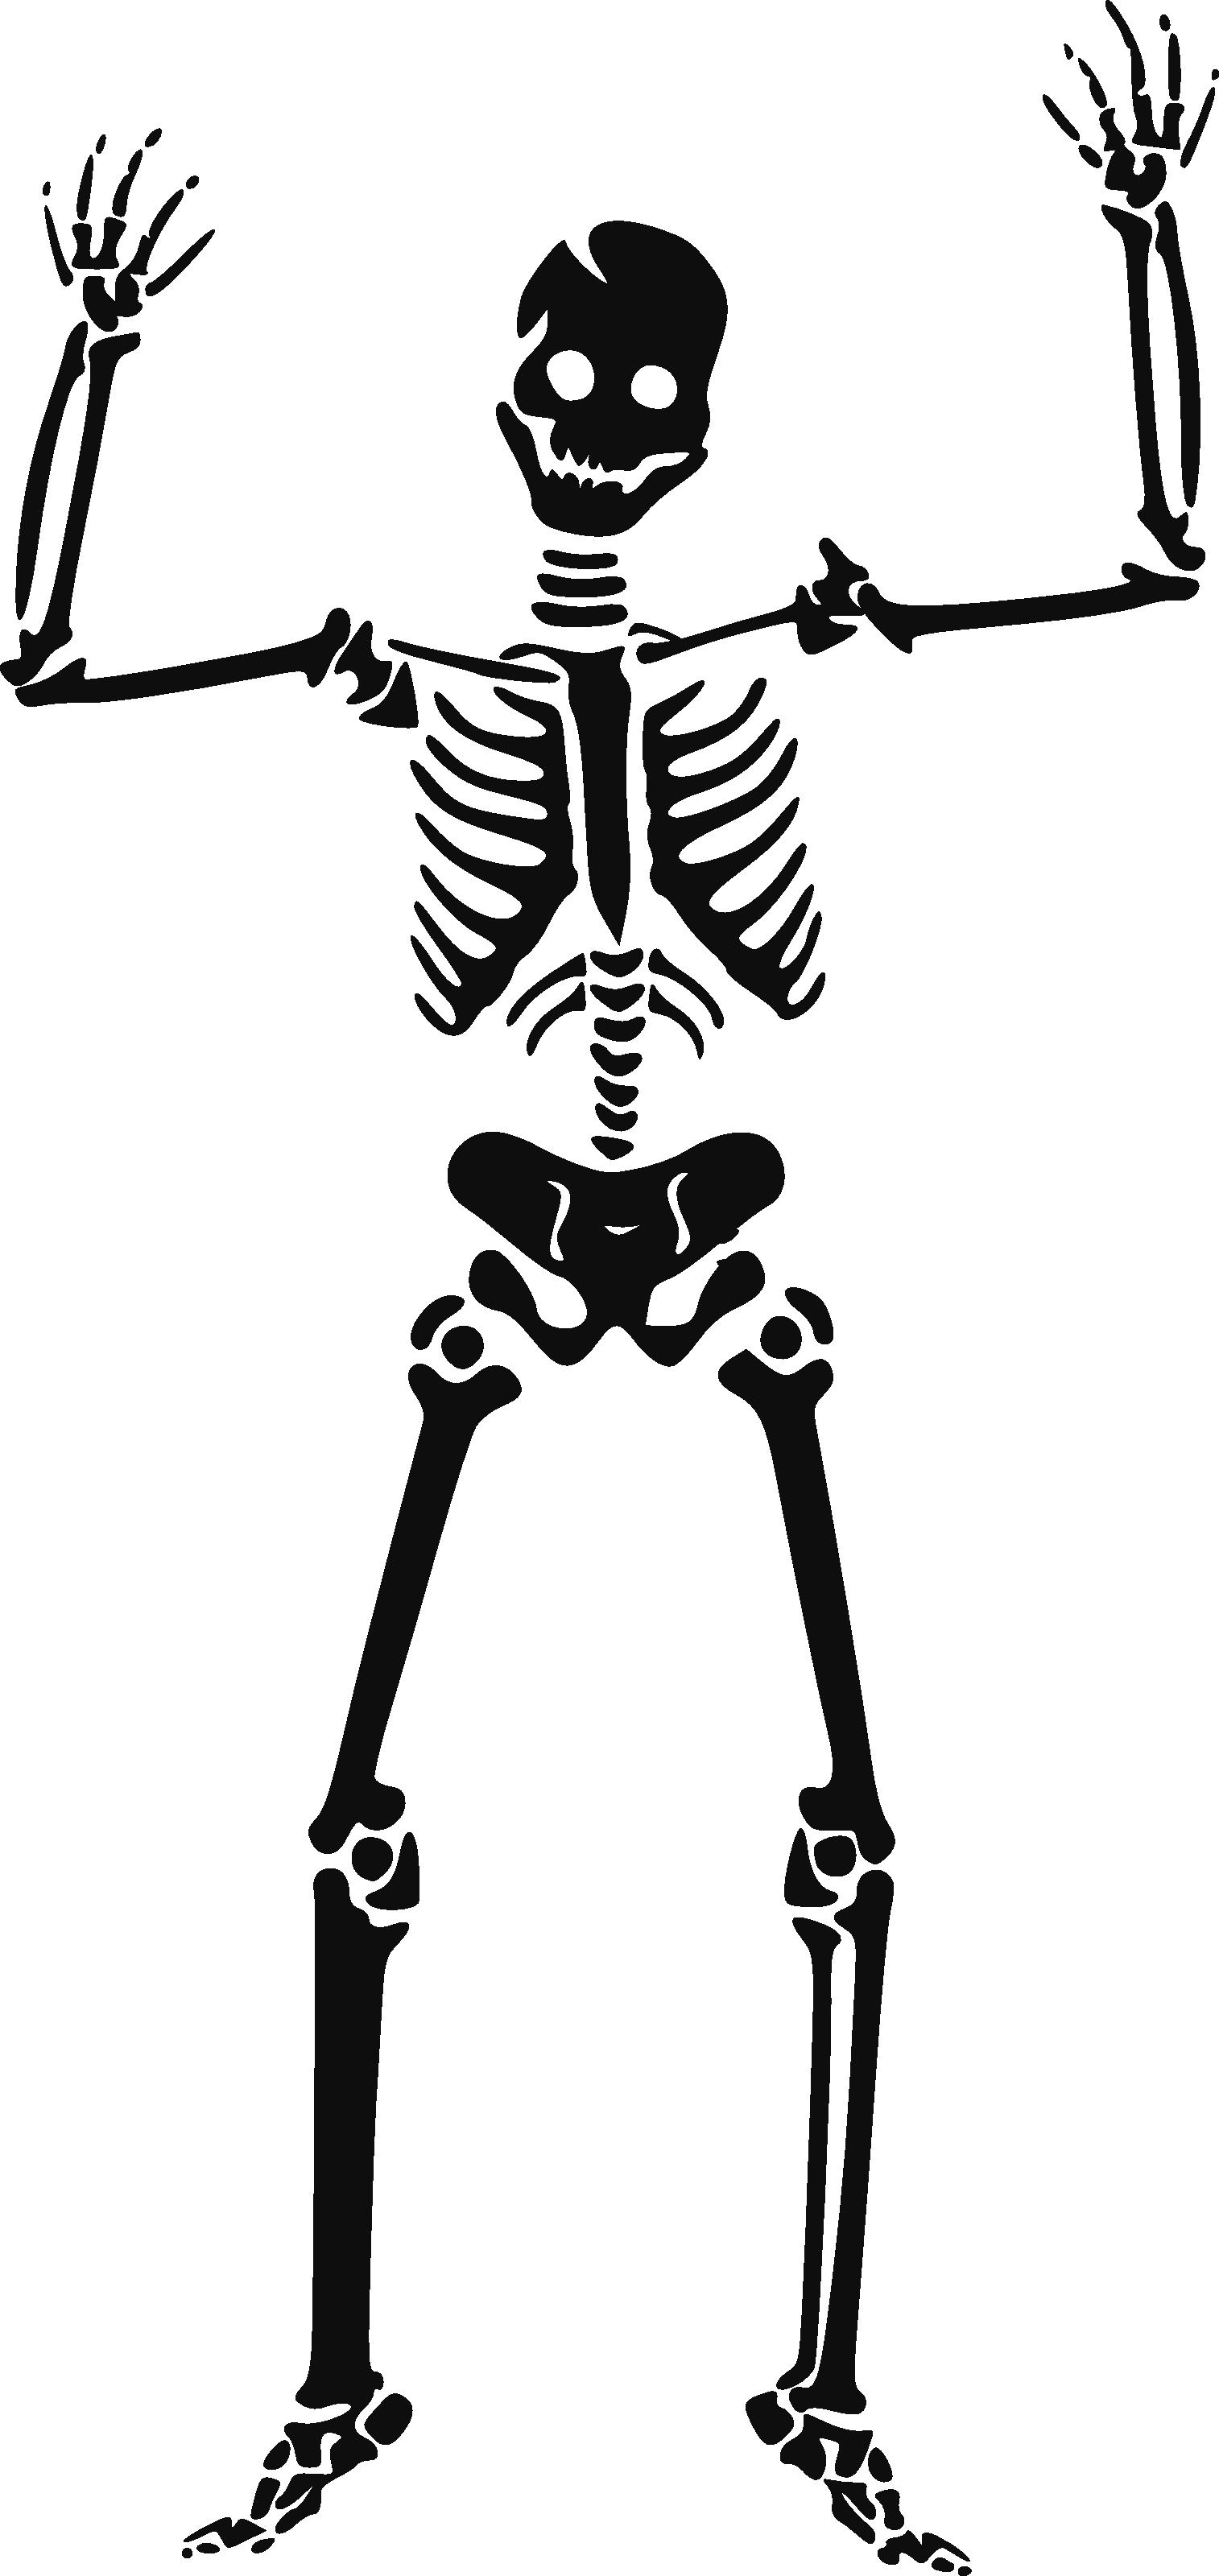 Public Domain Famine Clipart